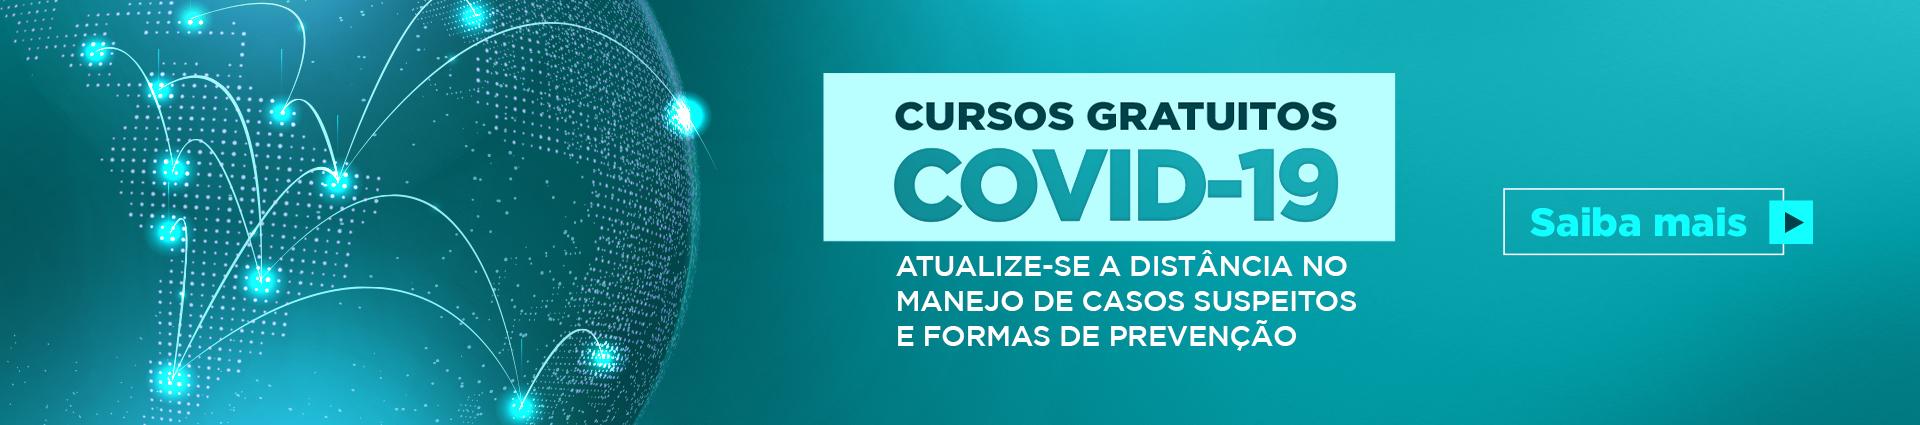 Banner_3_Cursos_COVID-19